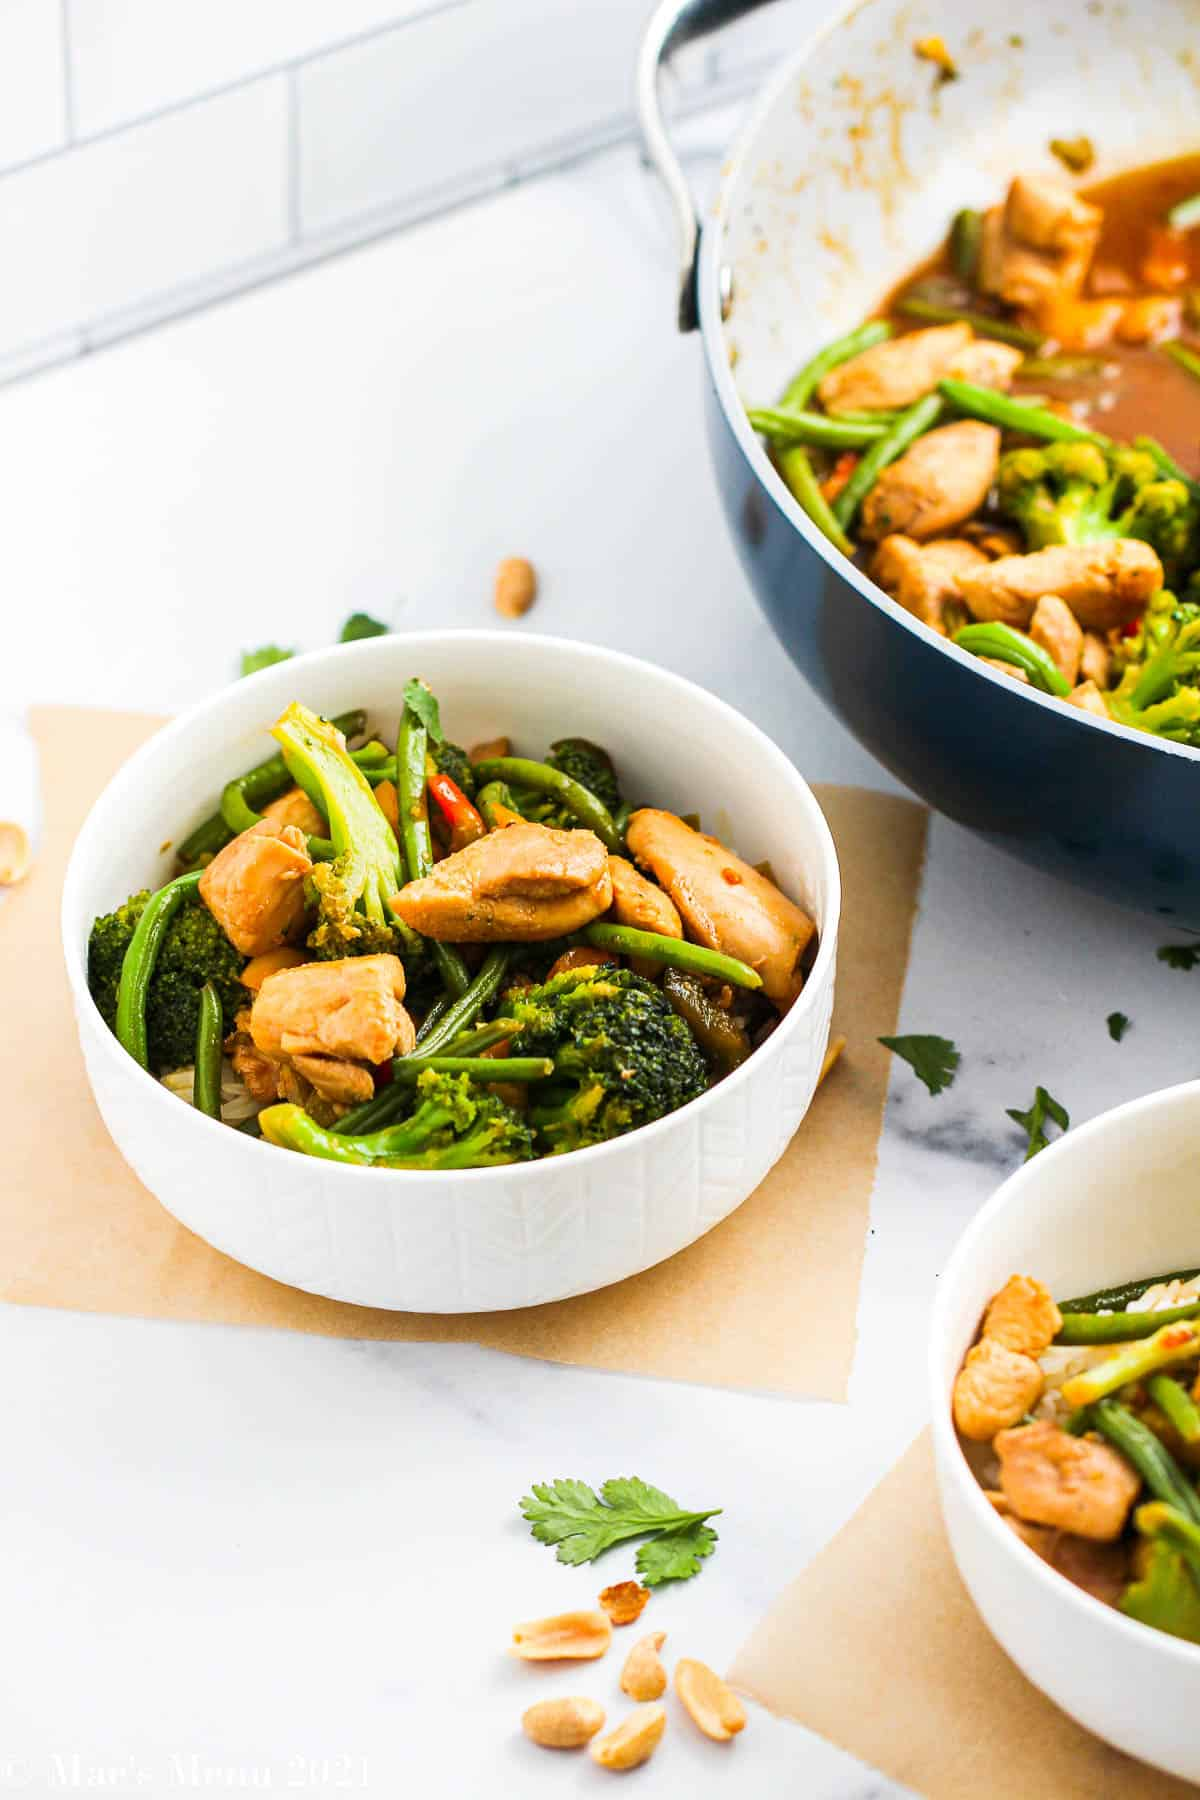 2 bowls of chicken stir-fry with frozen veggies on a granite countertop